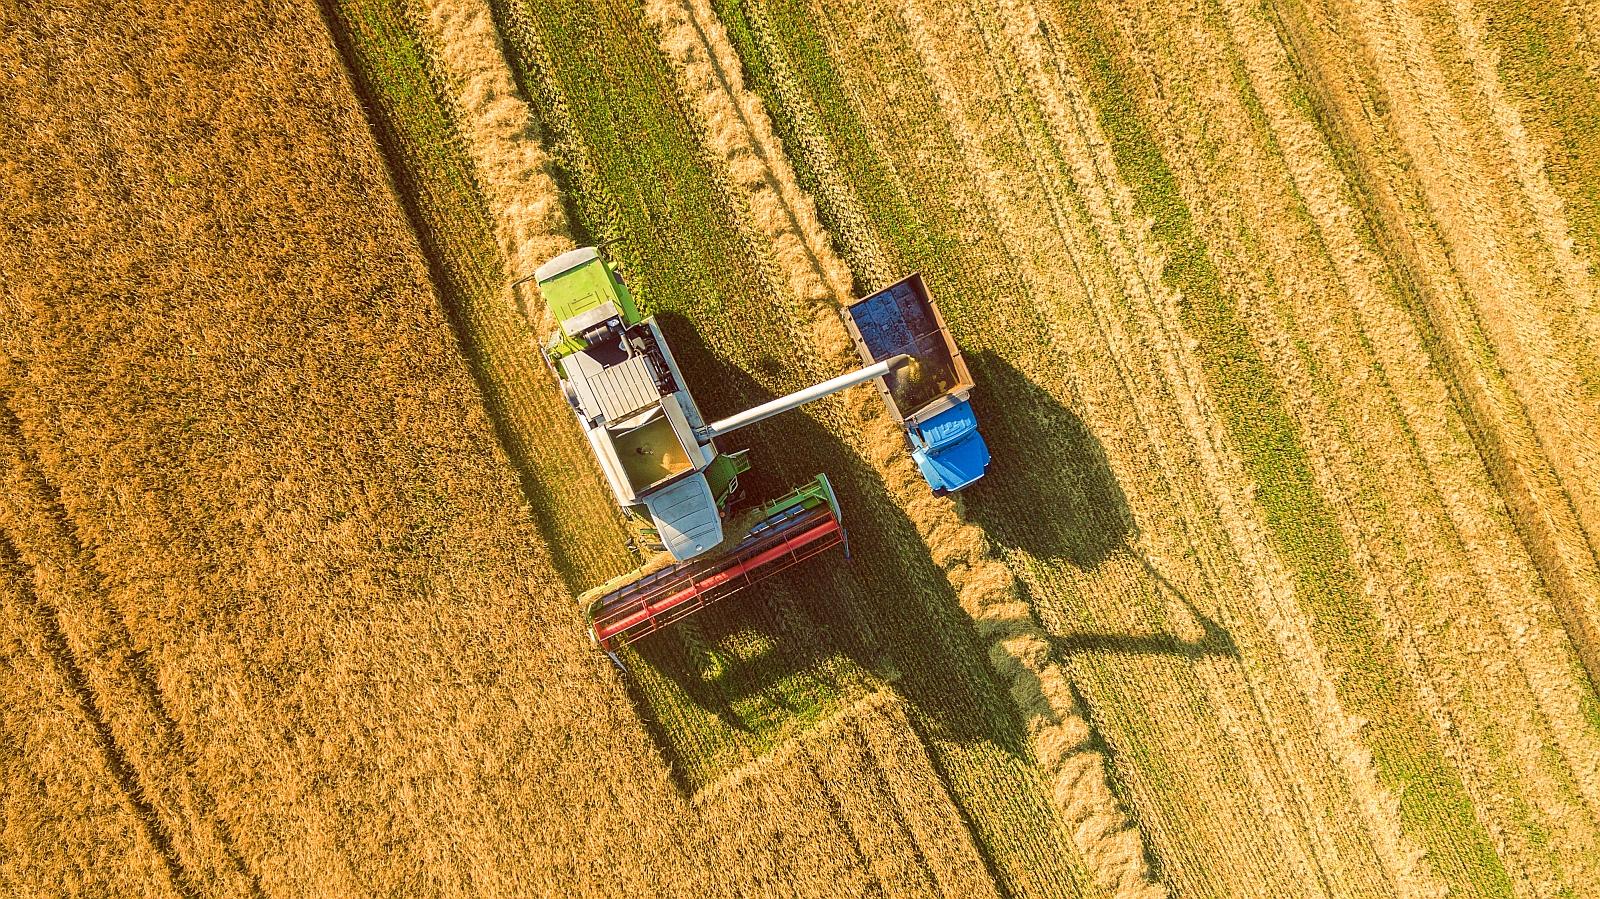 harvesting grain